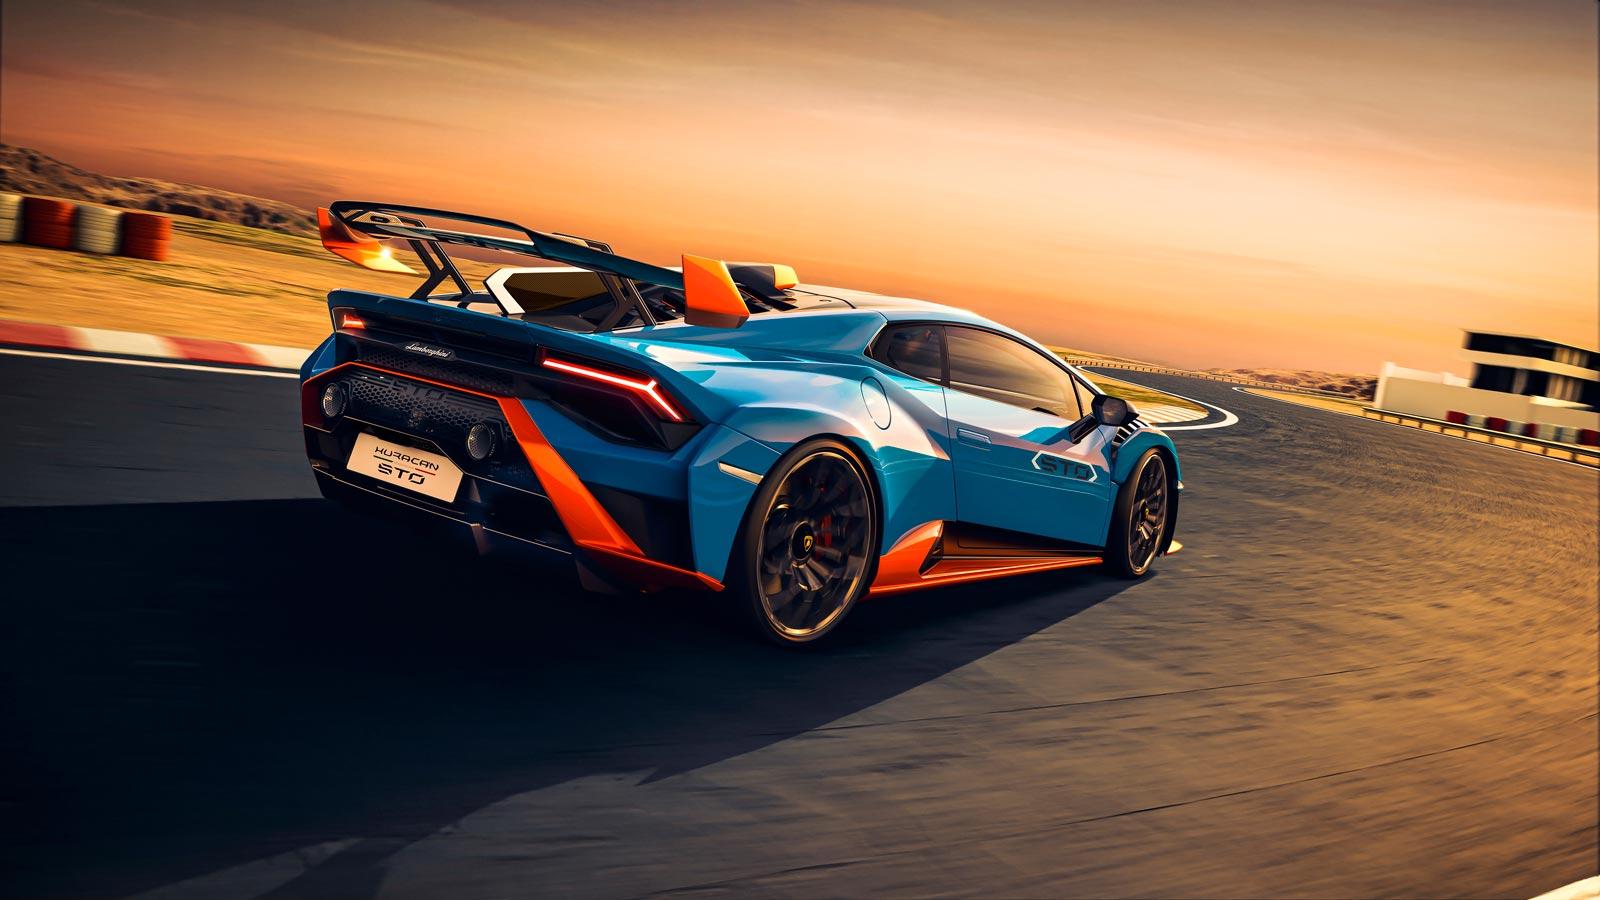 Lamborghini Huracan STO - From racetrack to road image 11